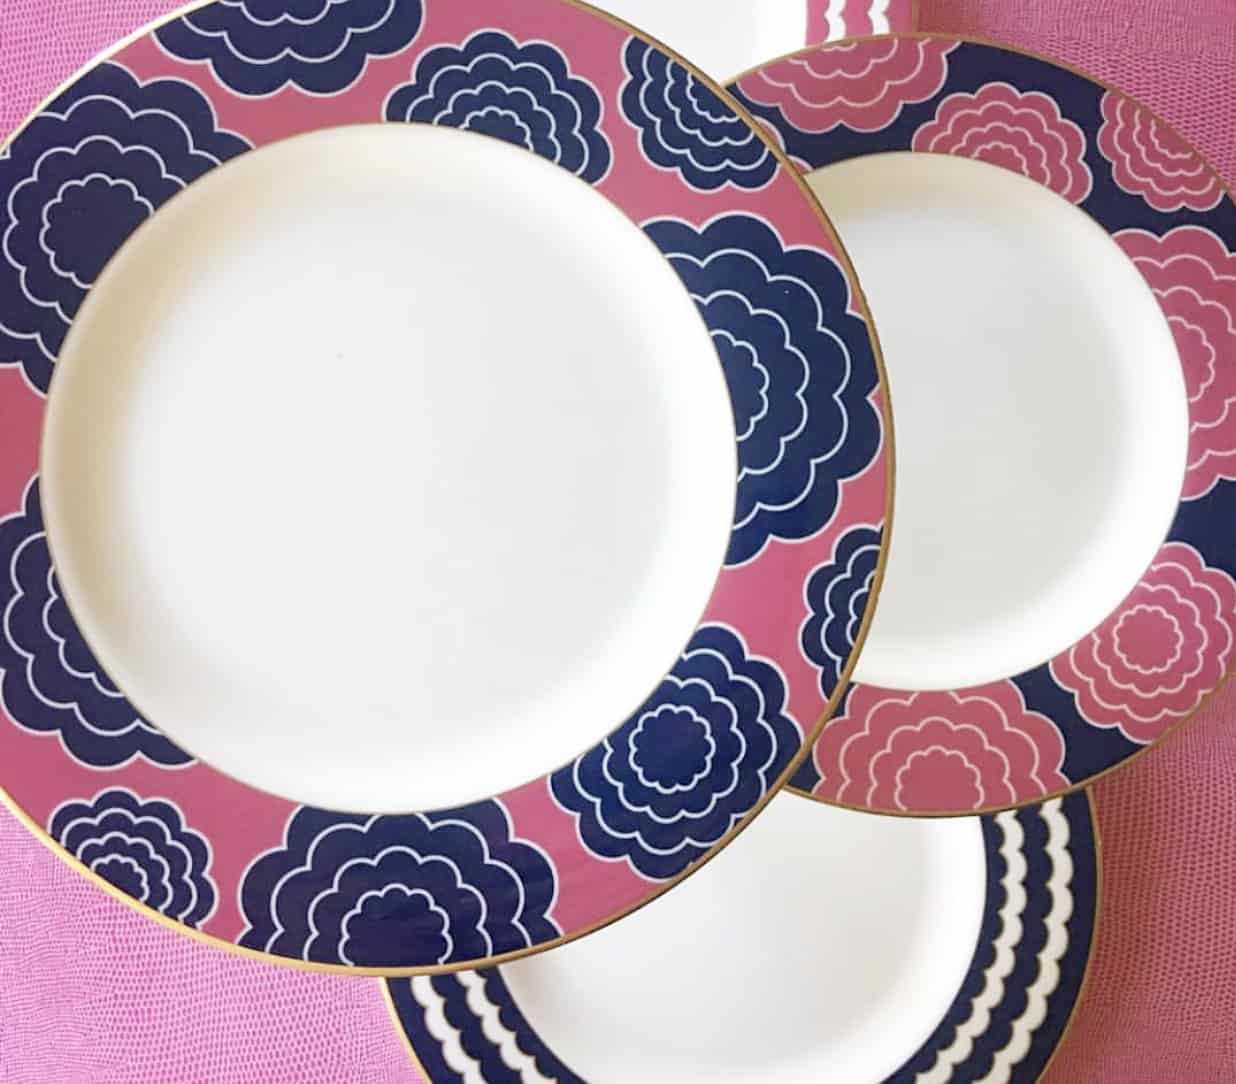 Lenox x Totally Tikaa dinner plates